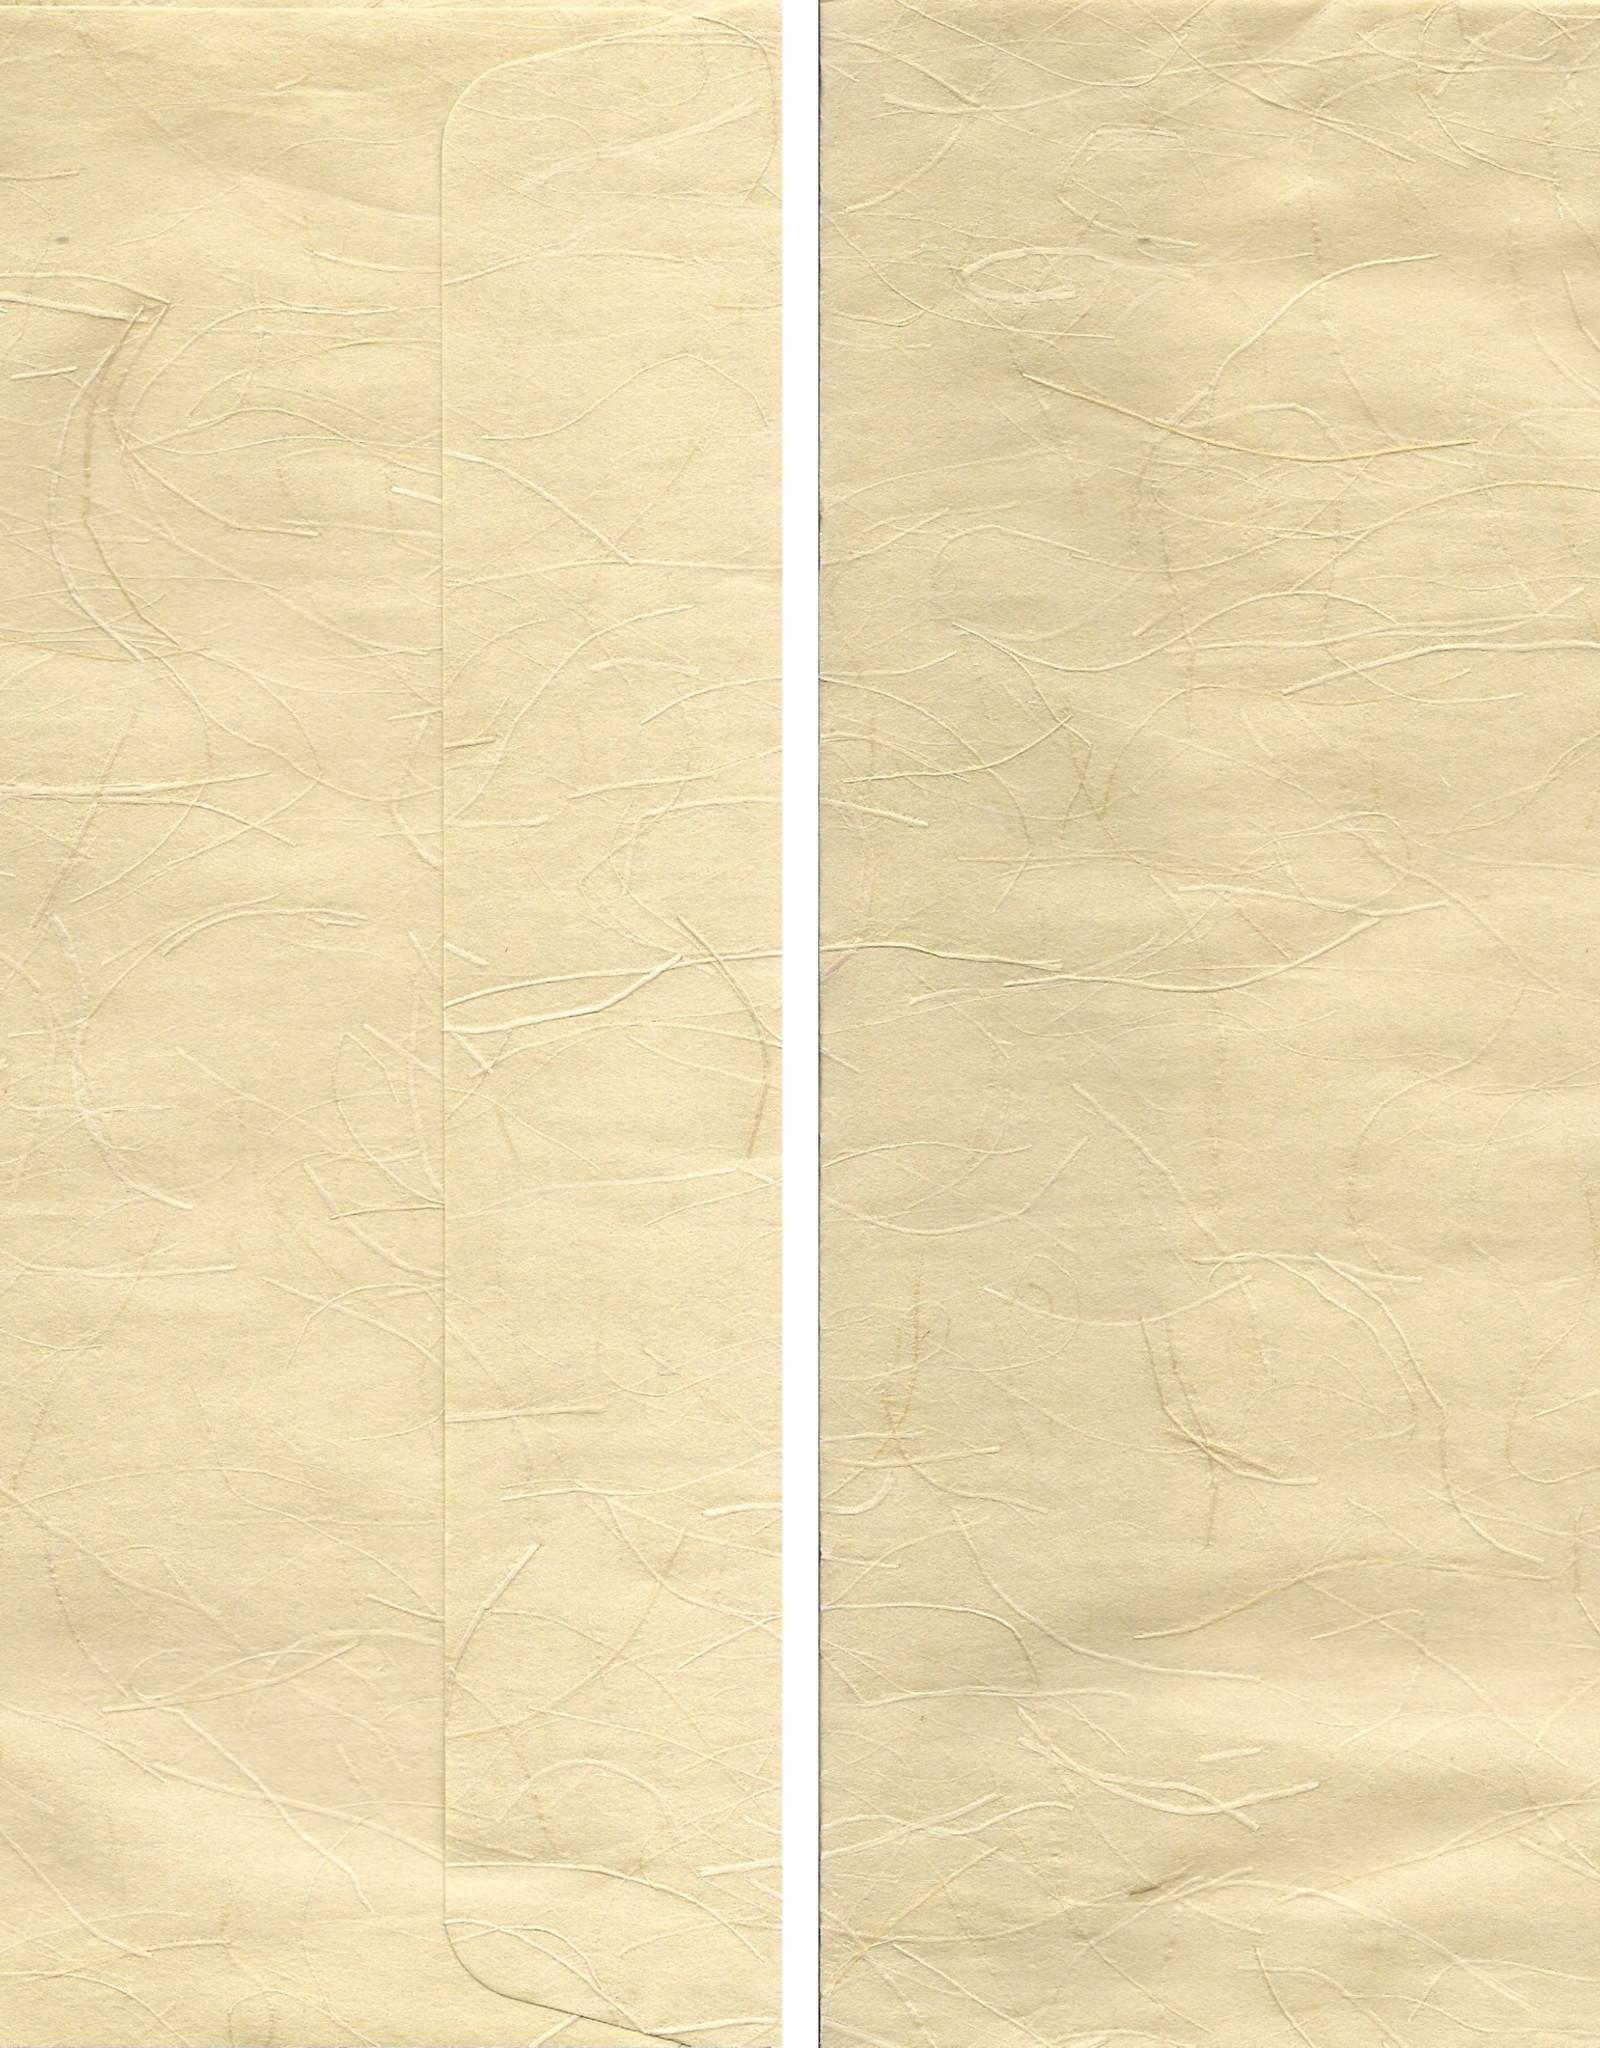 Dolphin Papers Awagami, Sand Beige Ogura, 5 Envelopes, C6 Size